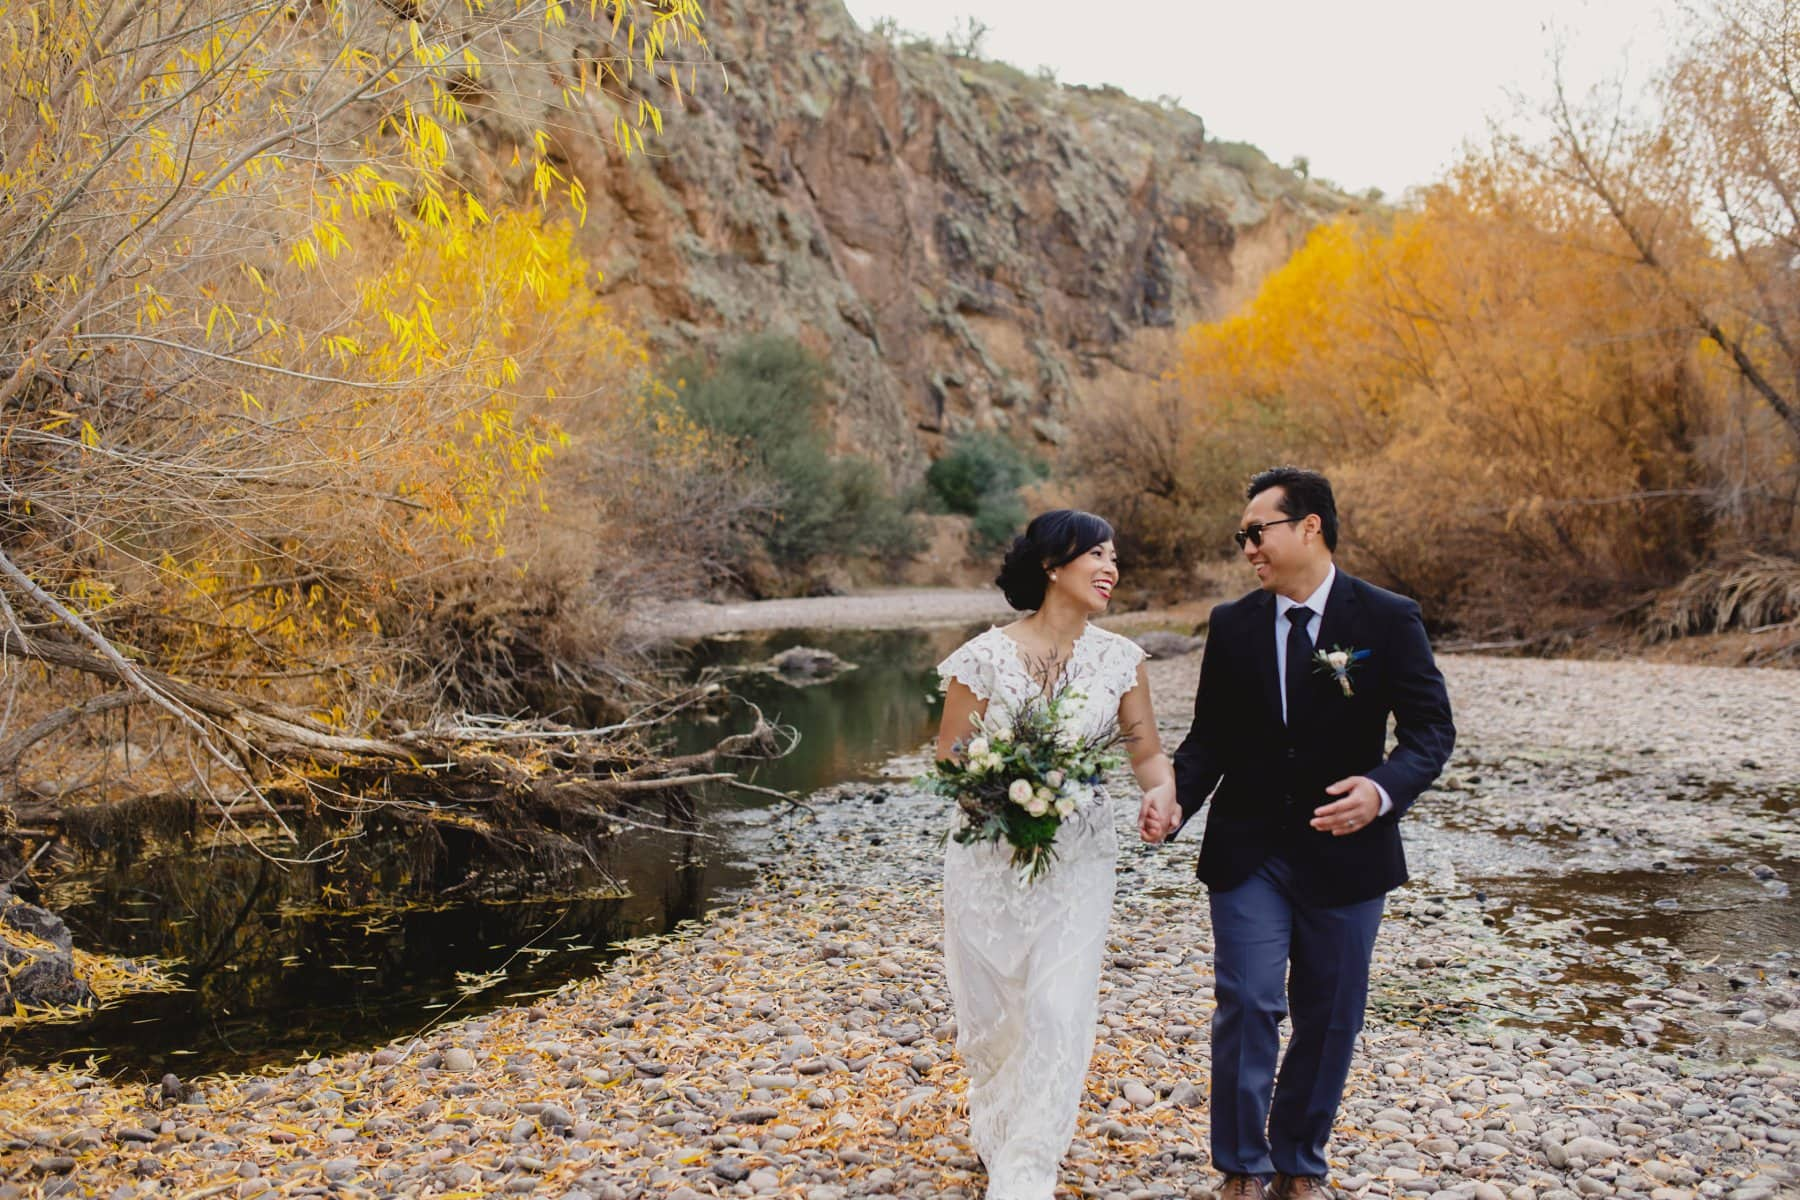 salt river small outdoor wedding in Arizona